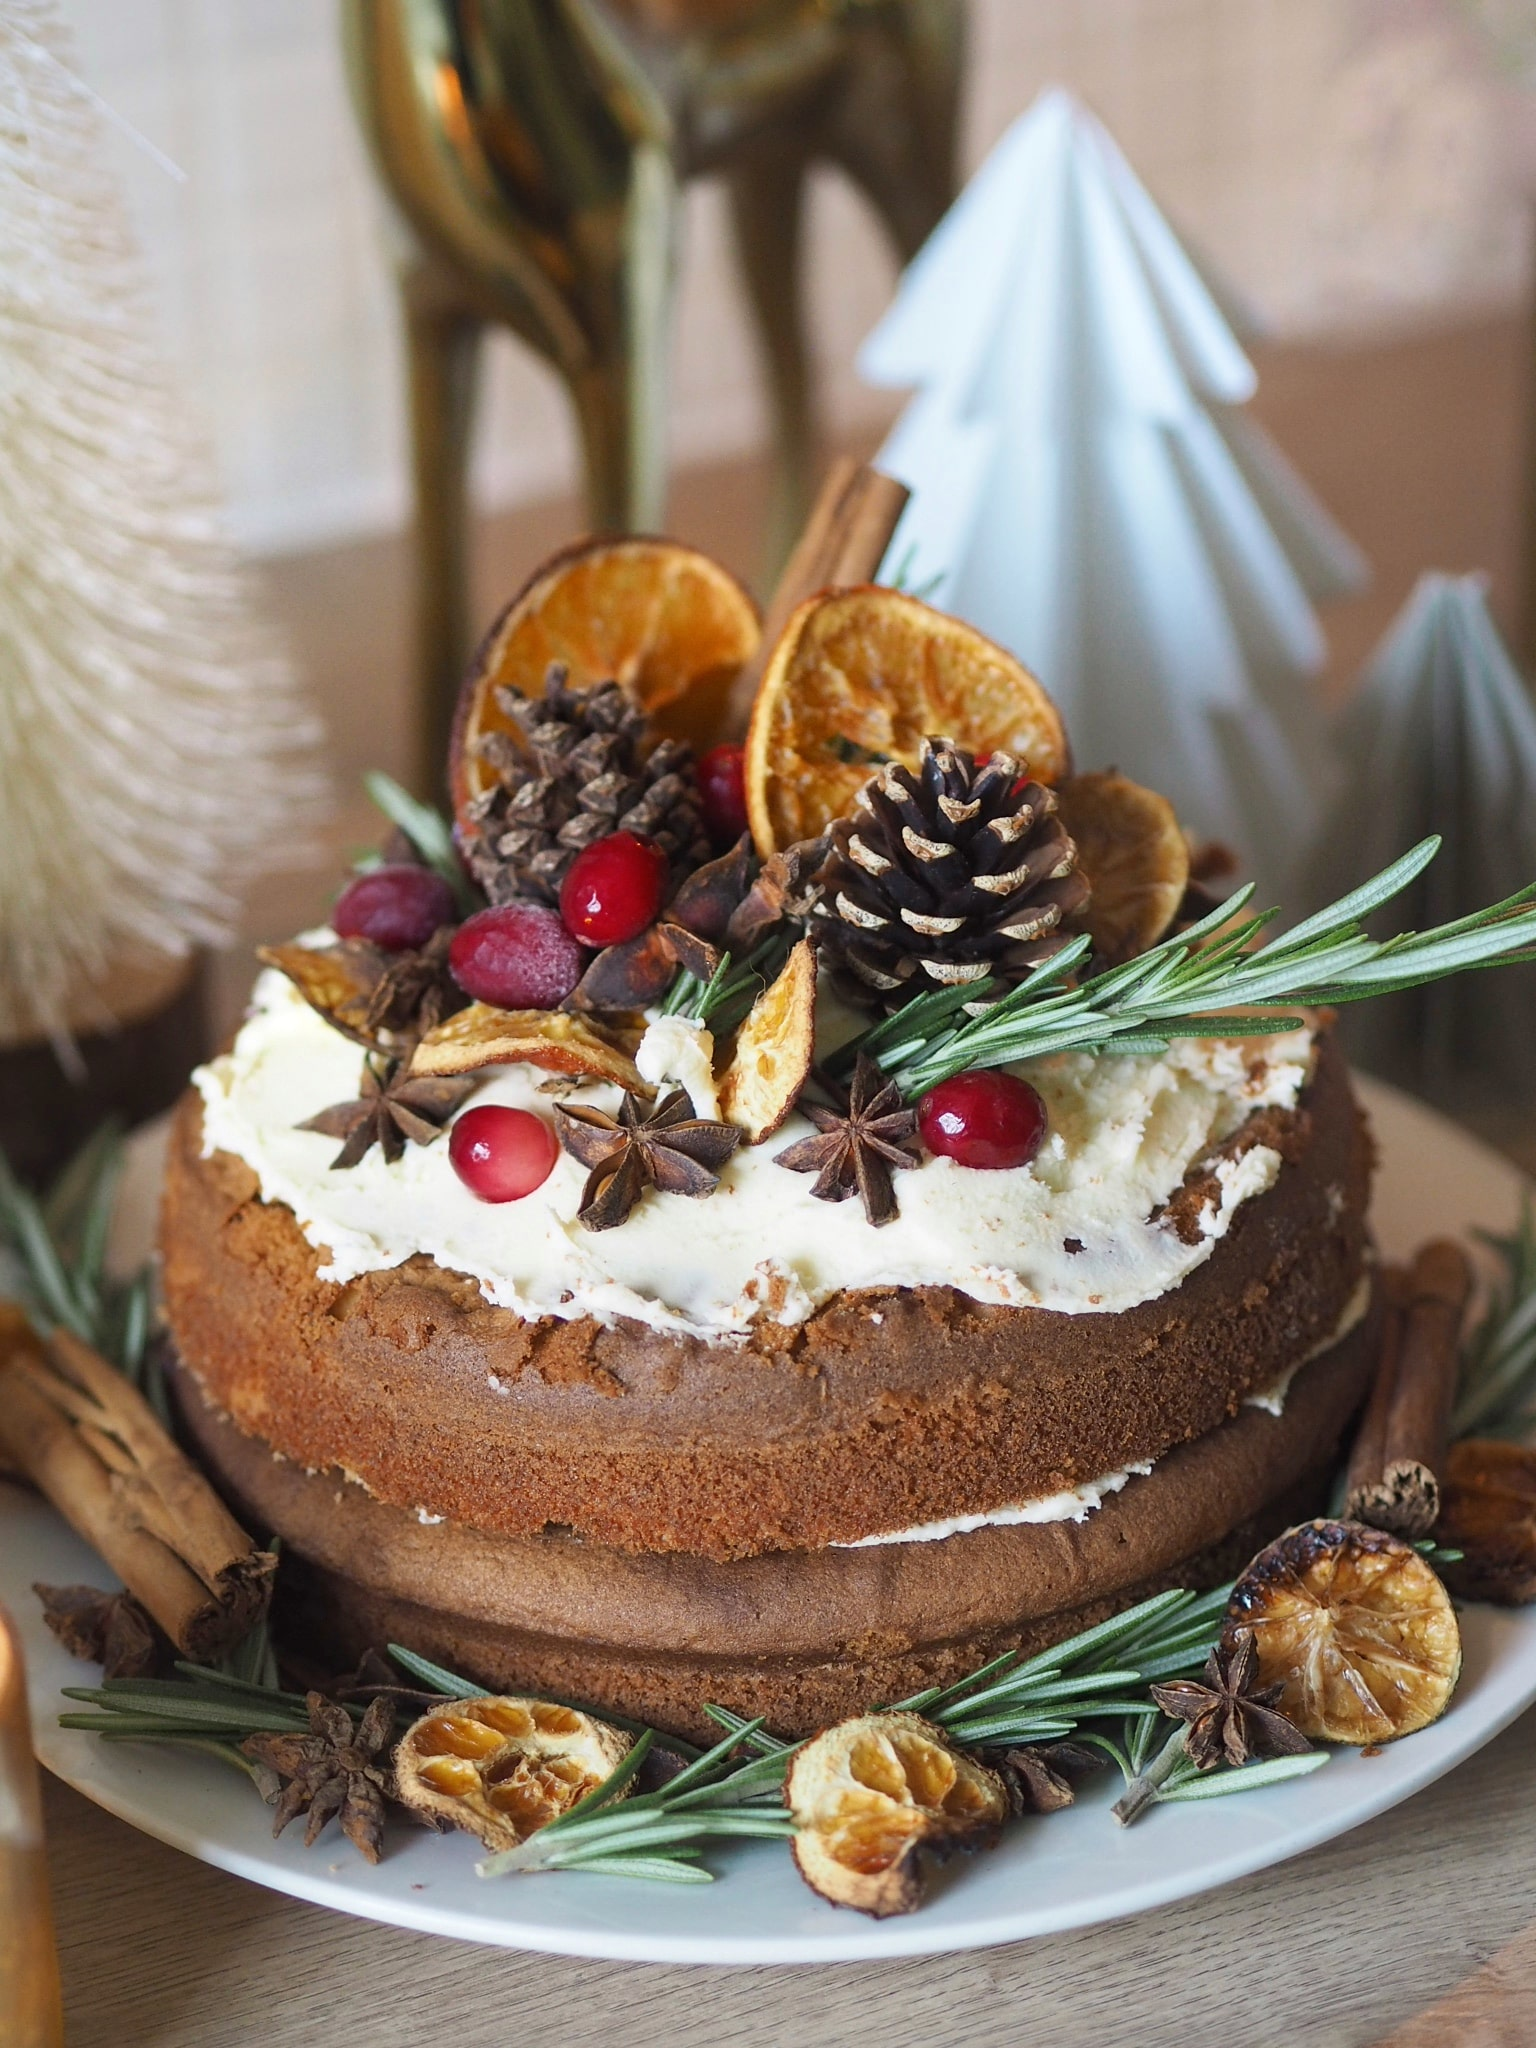 Christmas ginger sponge recipe - perfect alternative Christmas cake in this easy to make recipe